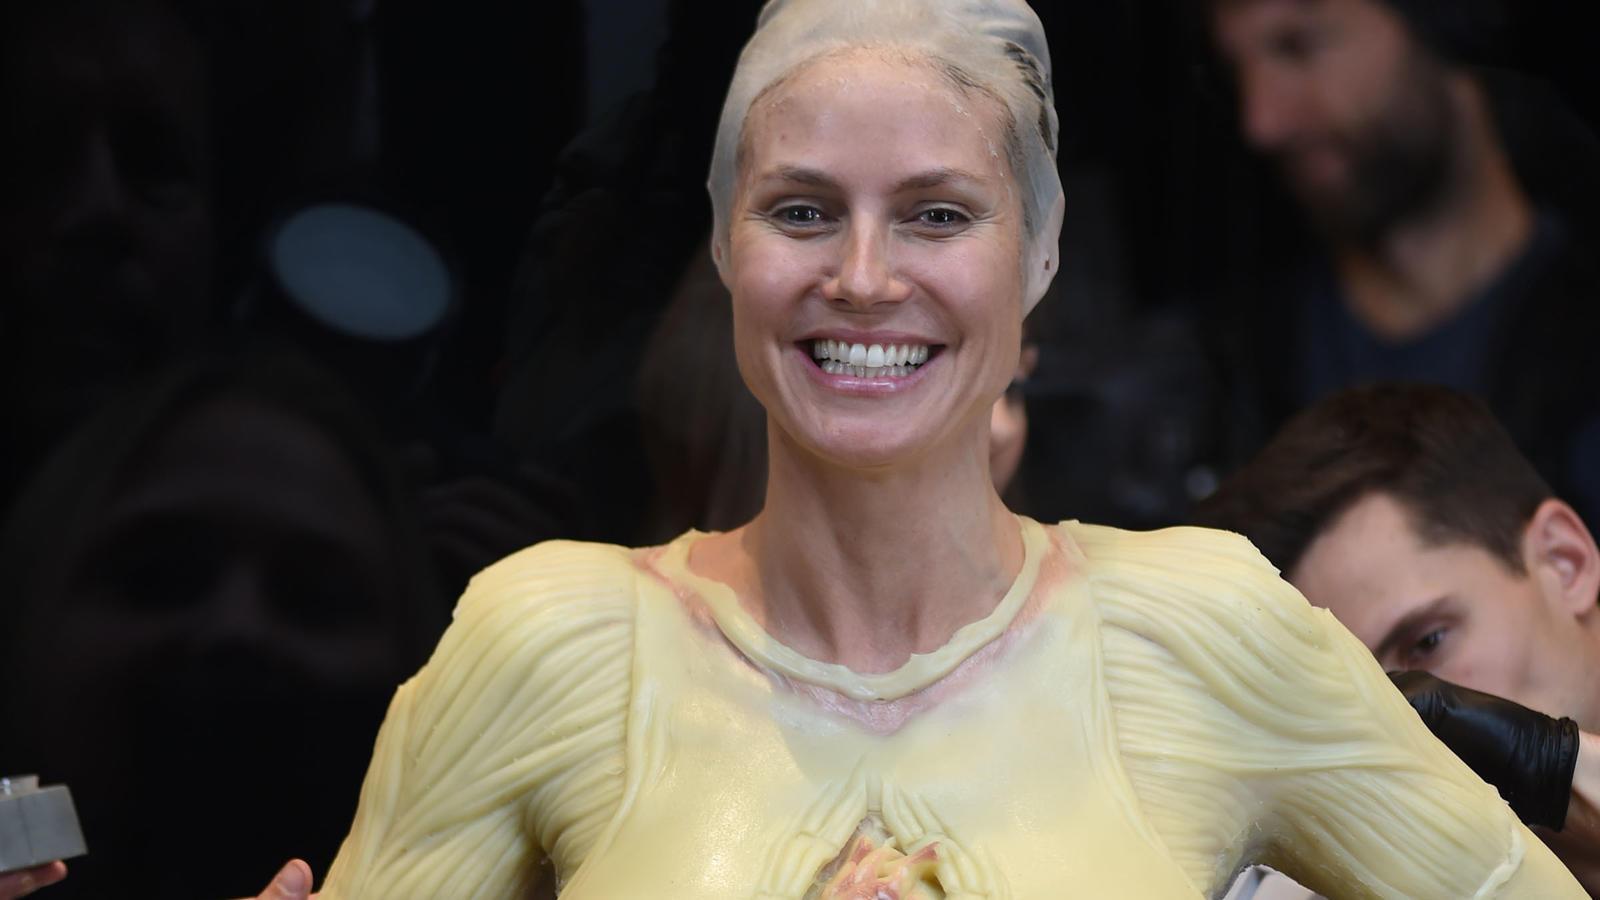 Heidi Klum feiert 2021 keine Halloween-Party.